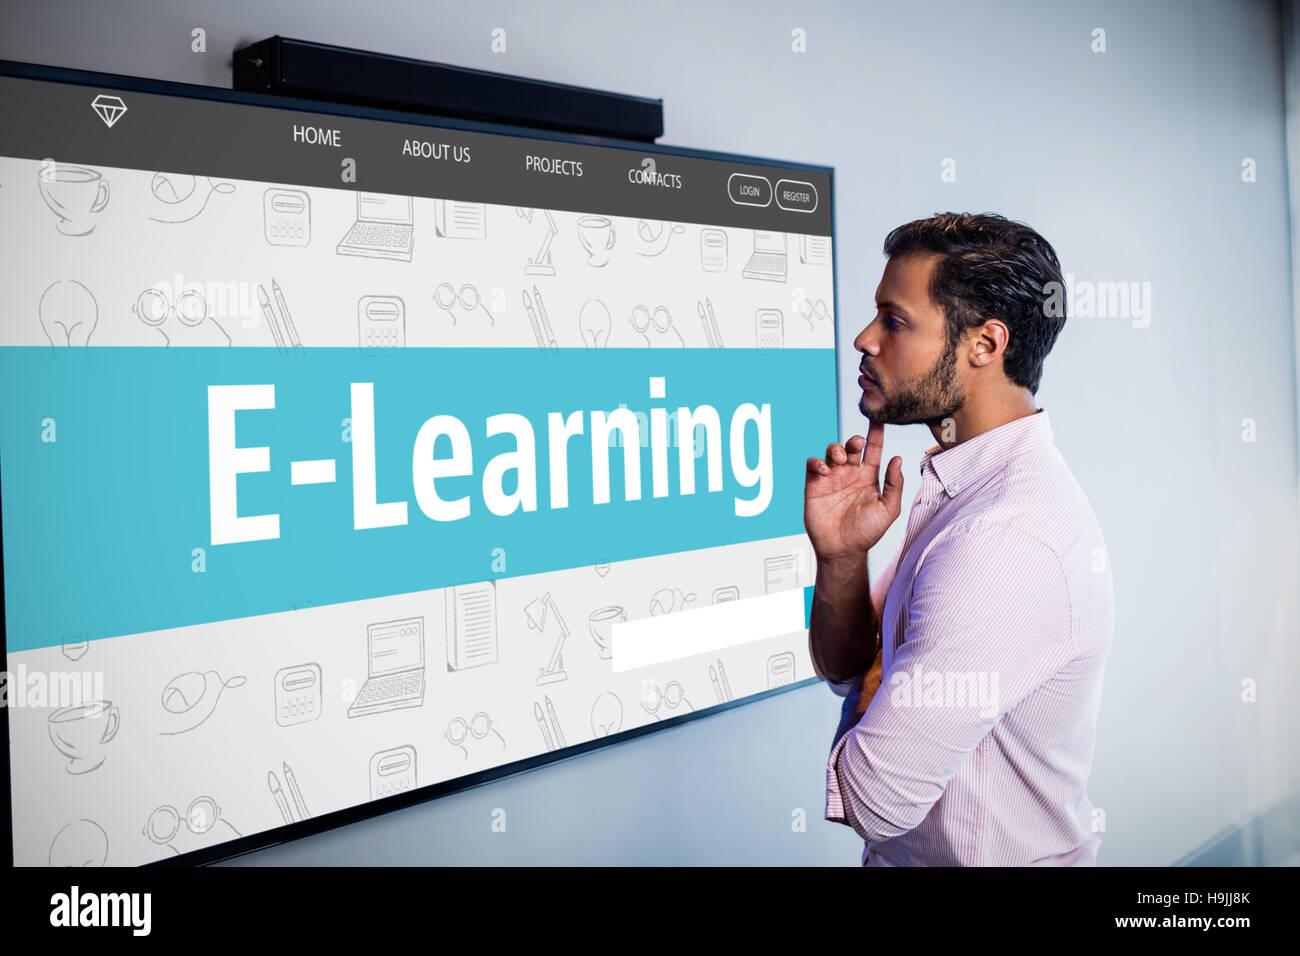 Imagen compuesta de interfaz de e-learning Foto de stock